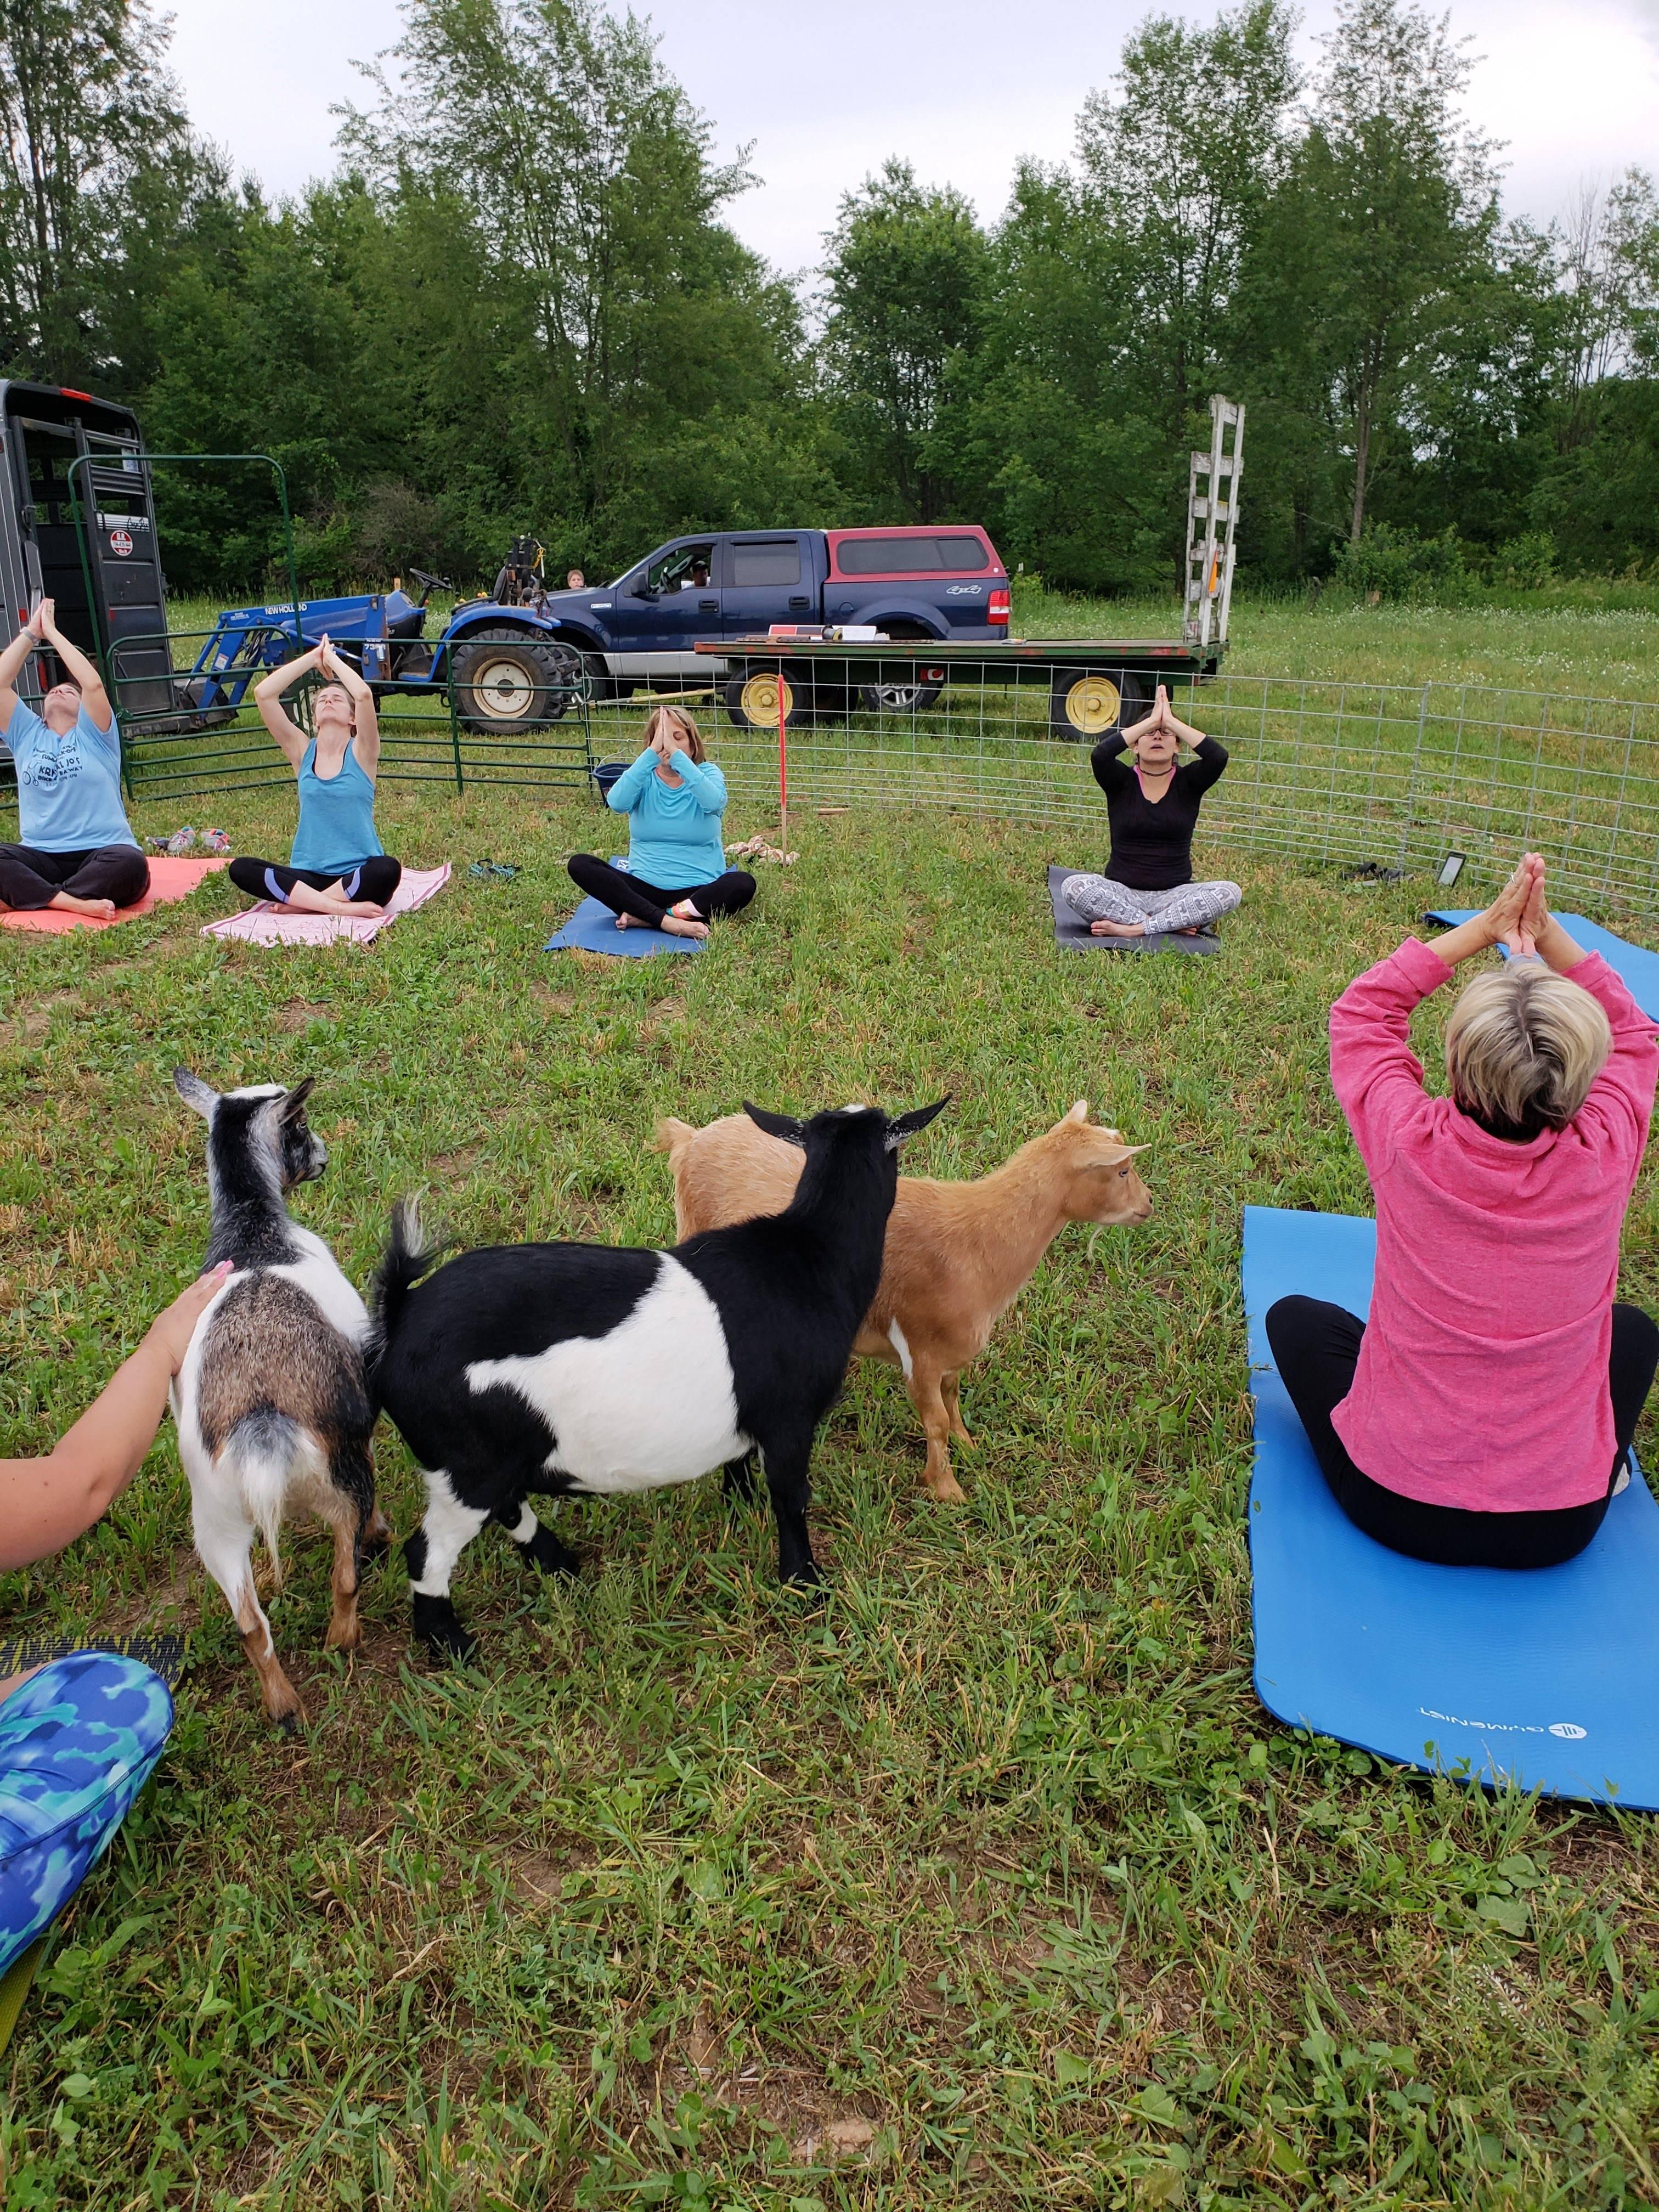 Many Great Yoga Poses